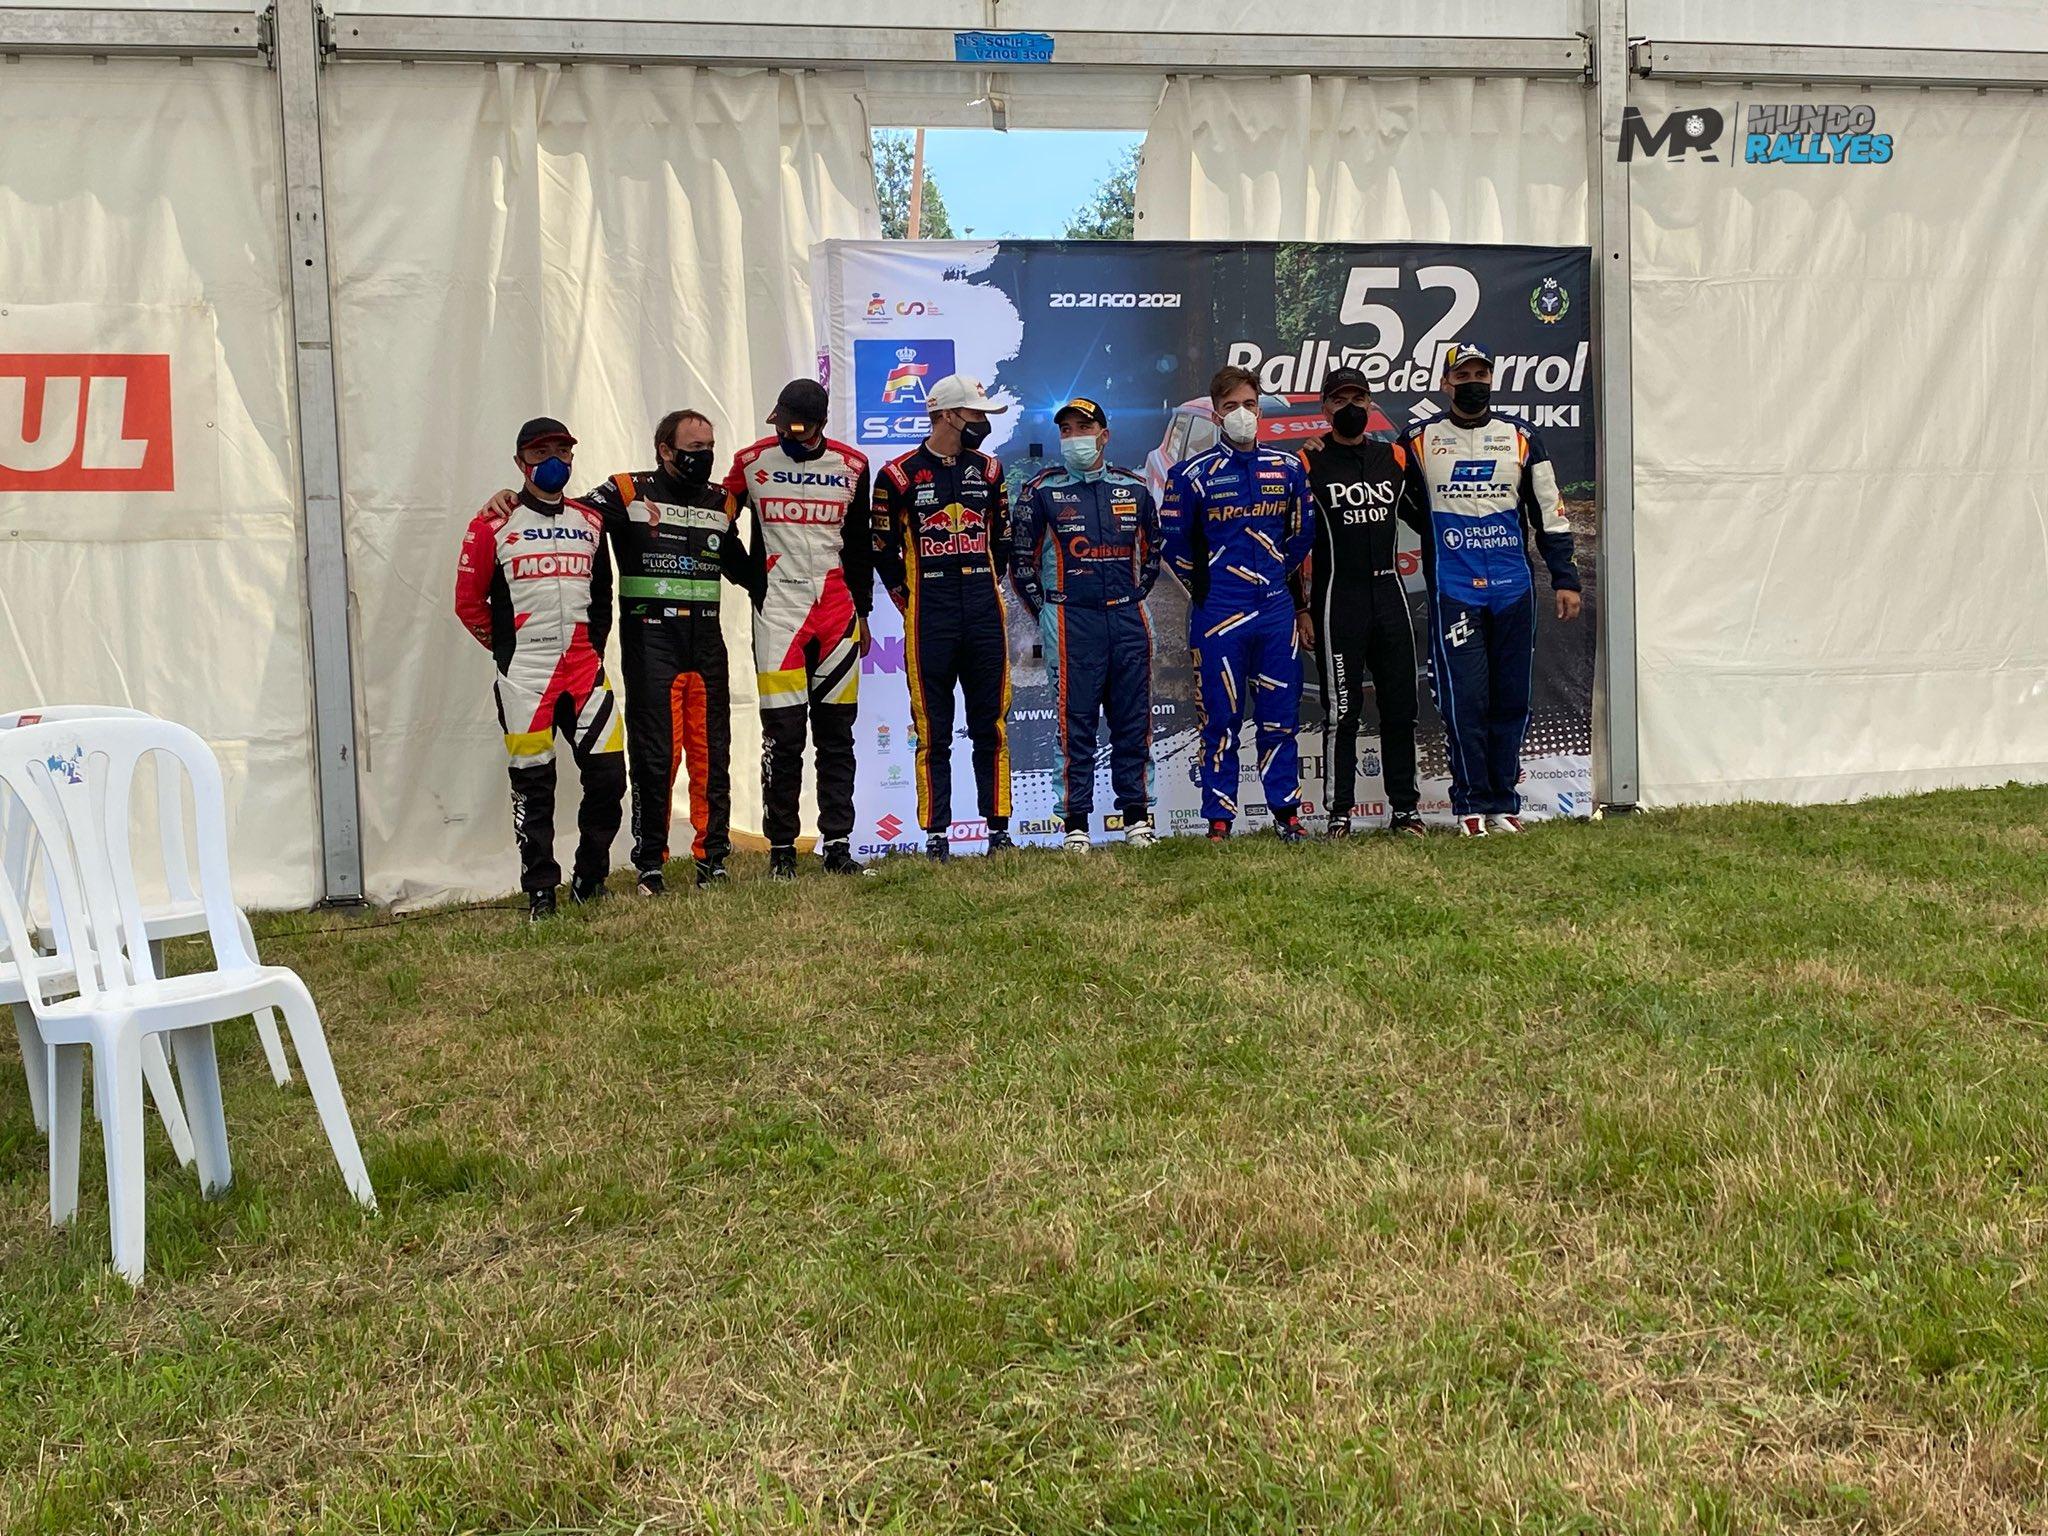 SCER + TER: 52º Rallye de Ferrol - Suzuki [20-21 Agosto] E9O6lAwWUAg-kyF?format=jpg&name=large